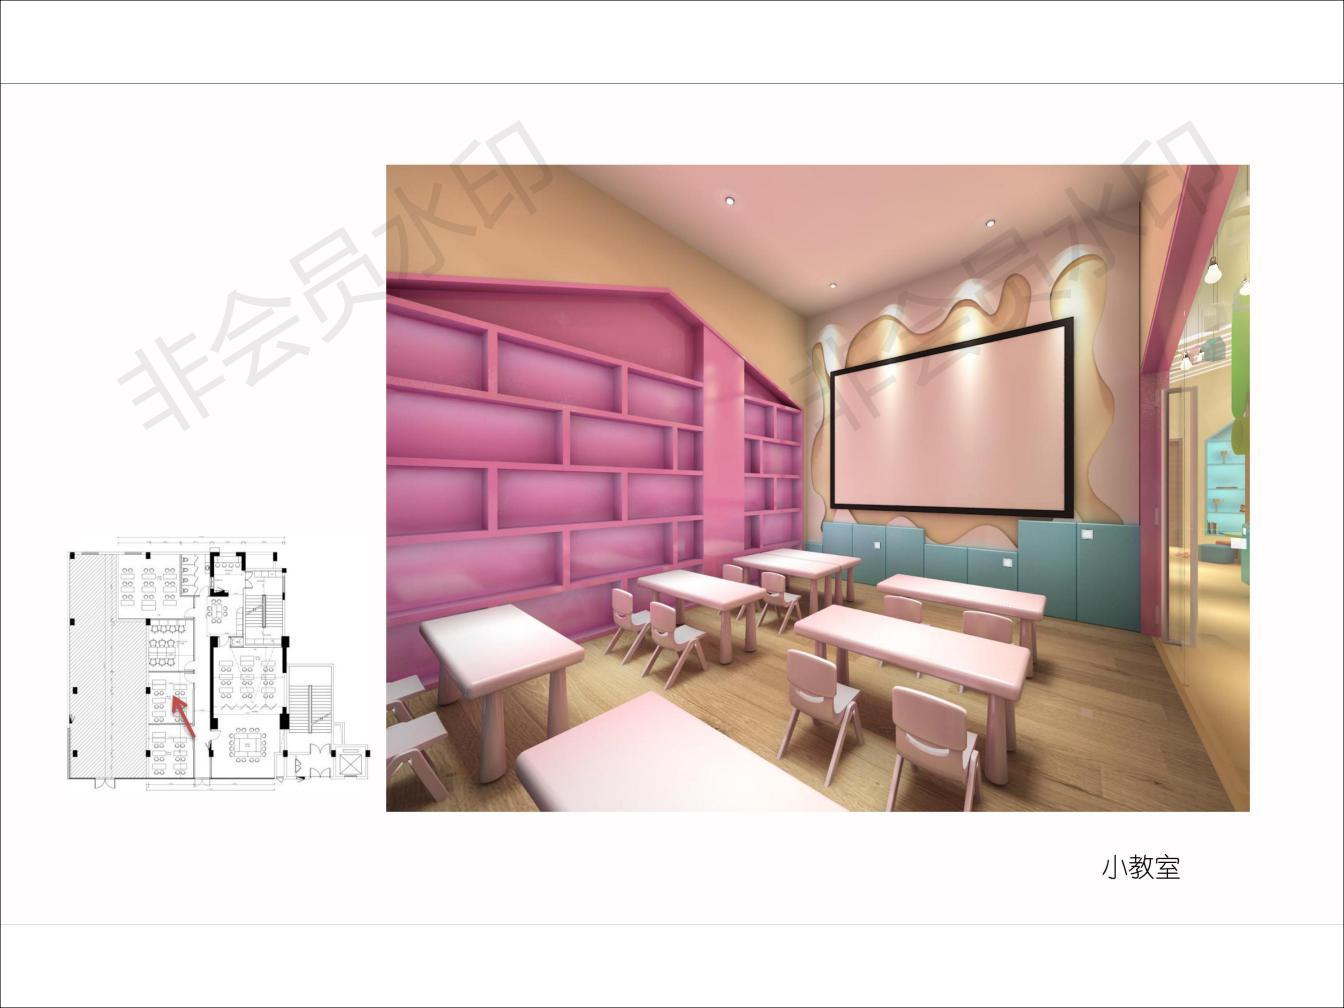 VIS设计定制品牌办公餐饮企业培训vi设计企业全套导视升级